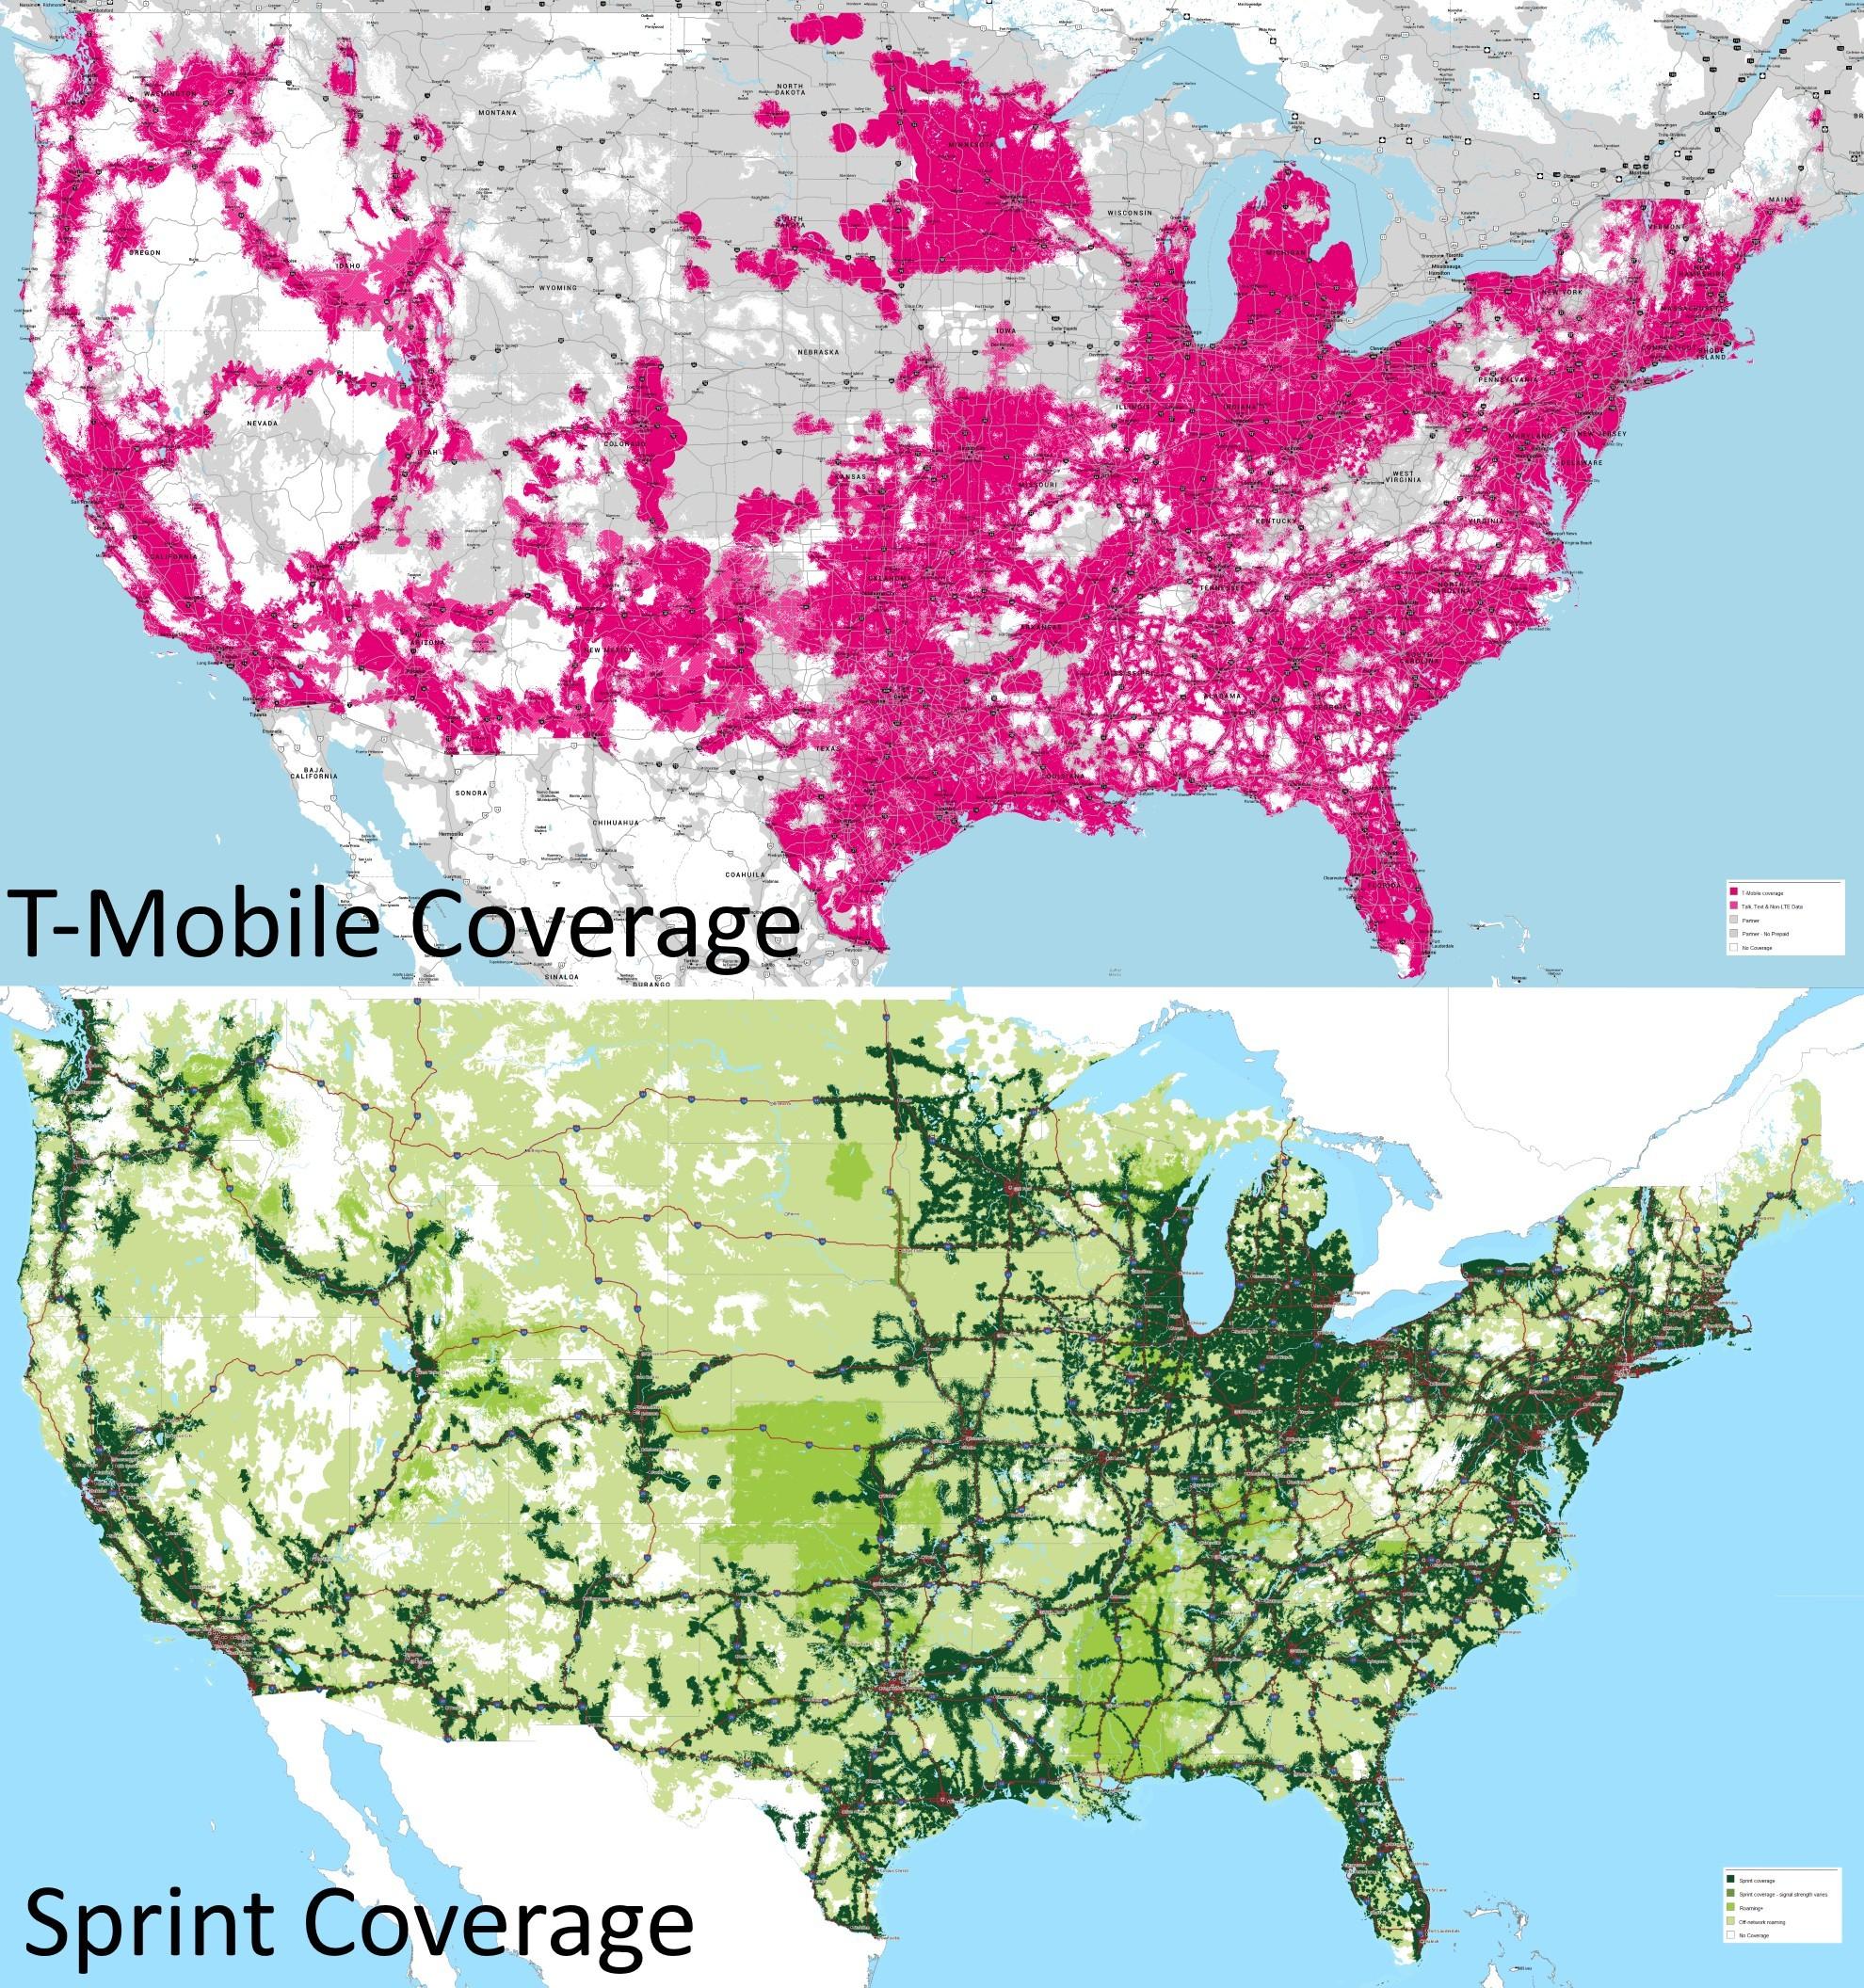 Sprint Us Coverage Map 2016 Sprintspectrumusmap Lovely Sprint - Sprint Coverage Map Texas